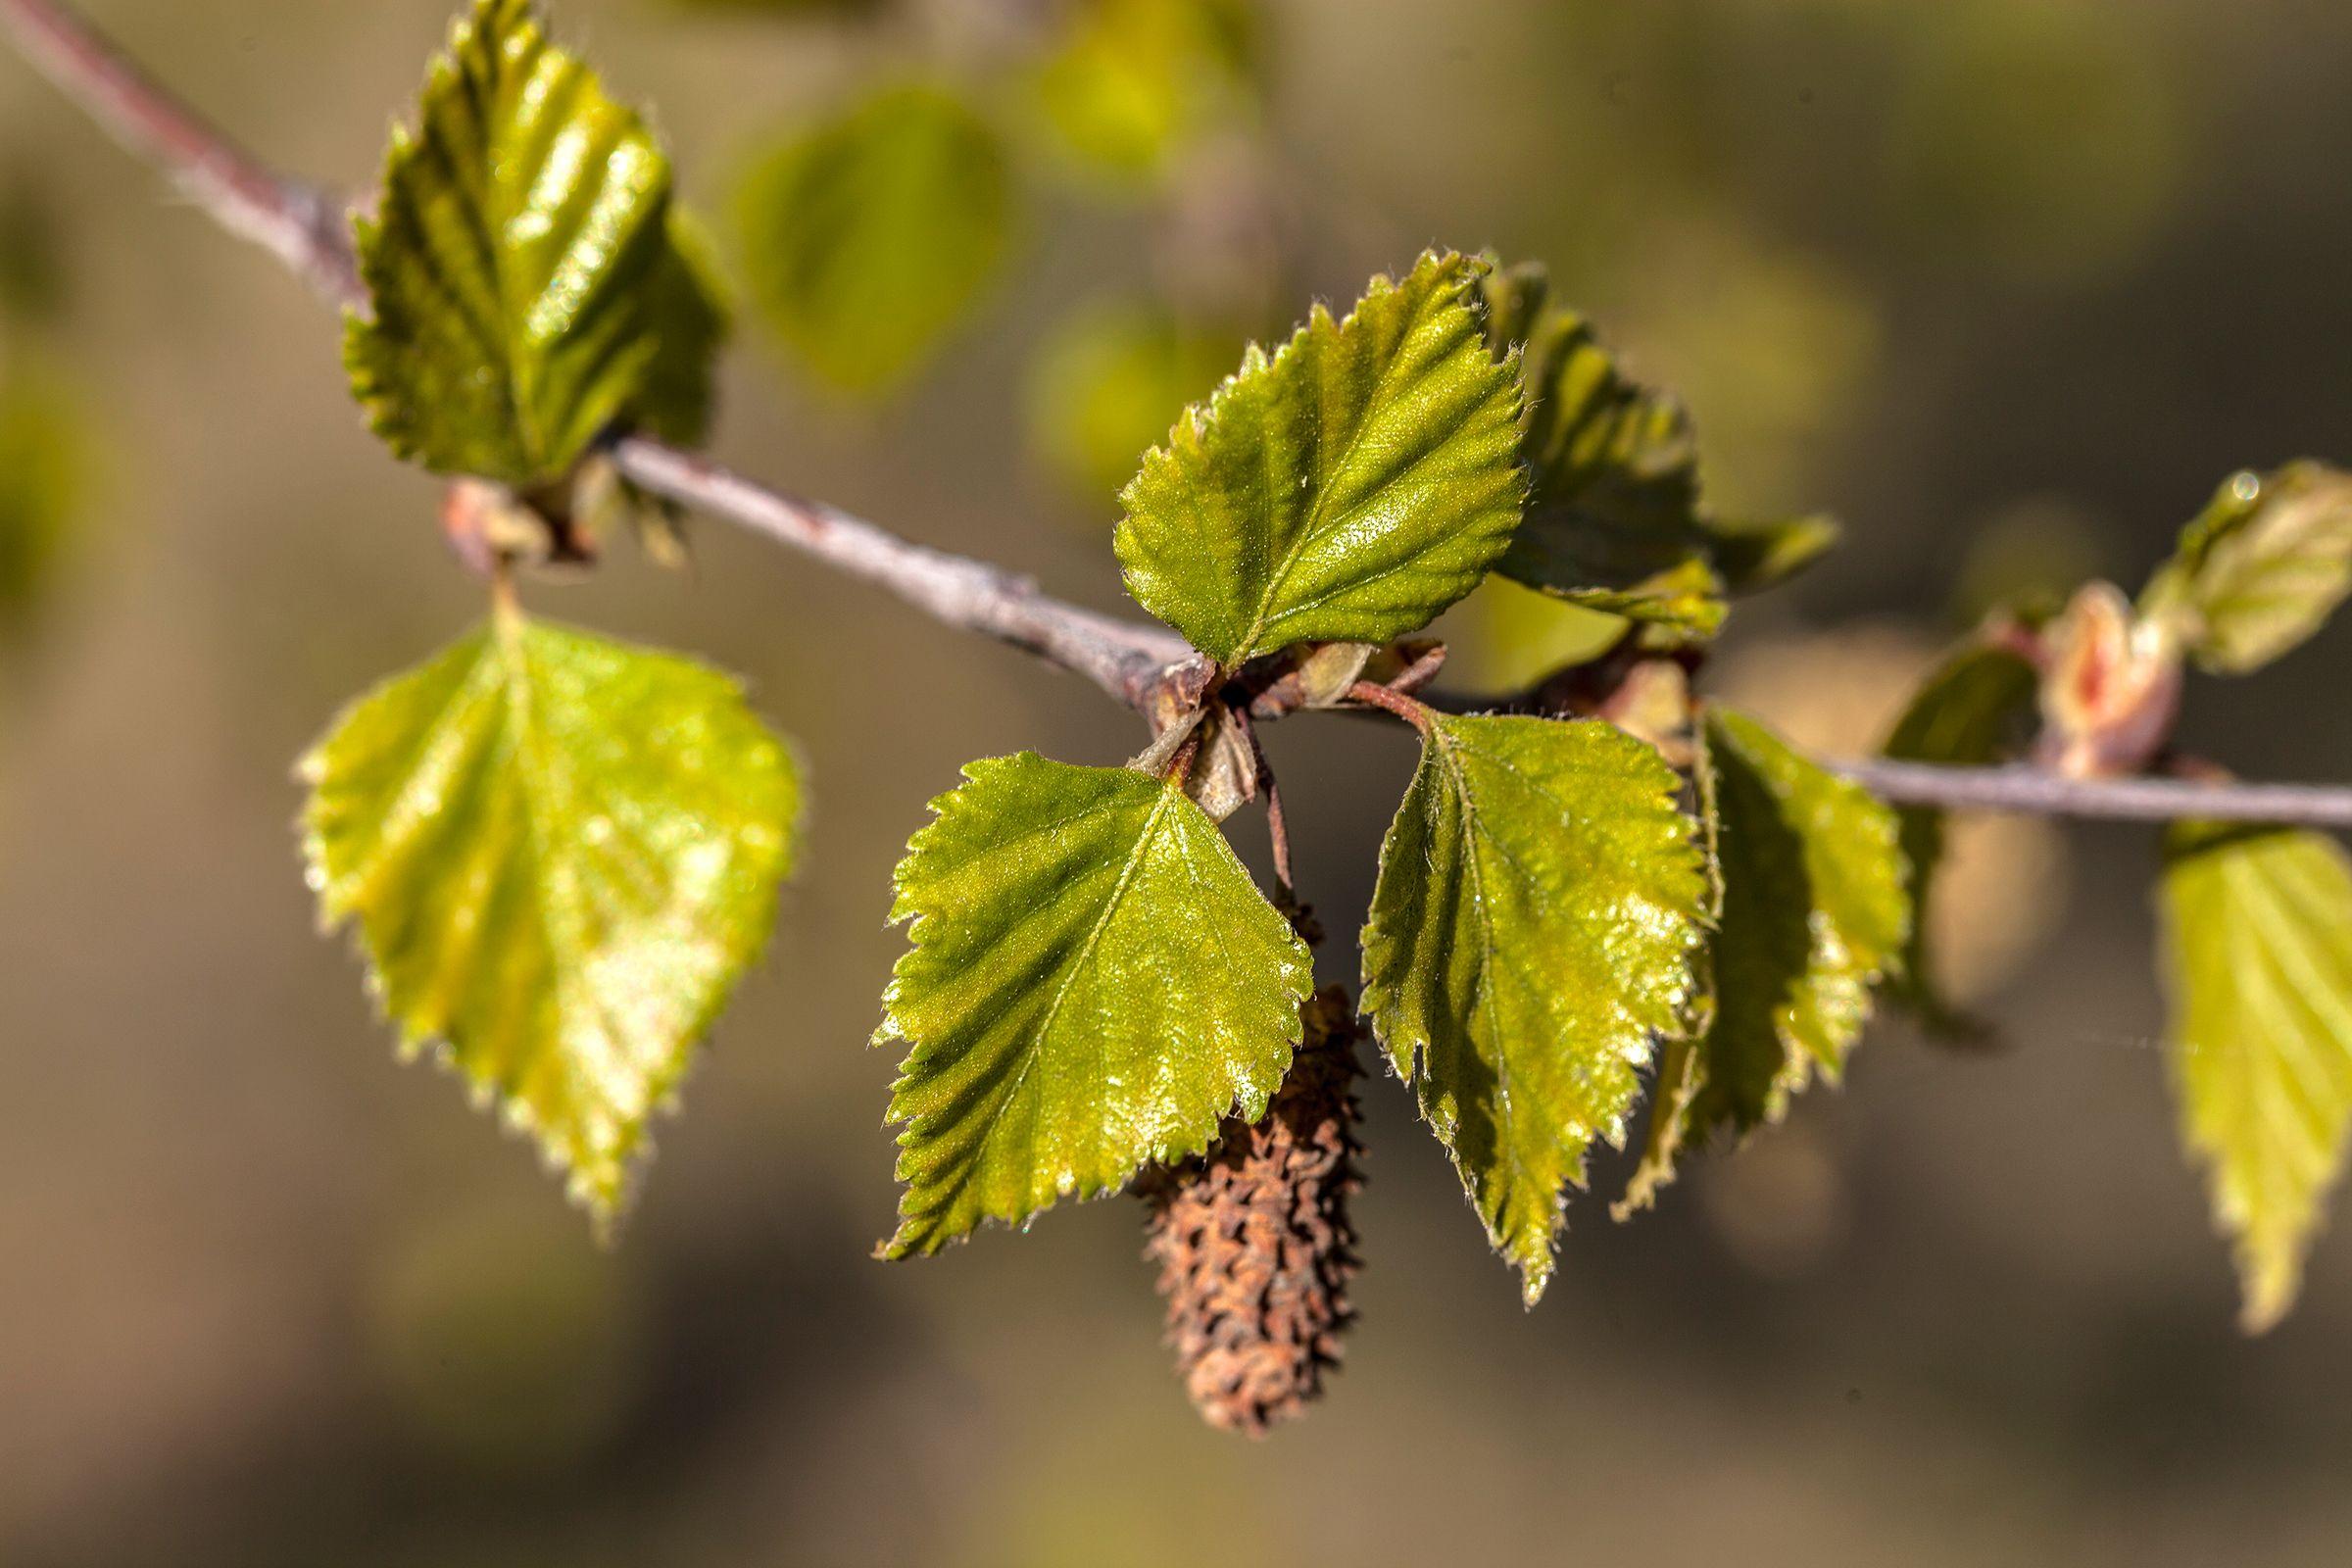 tratament comun cu frunza de mesteacăn